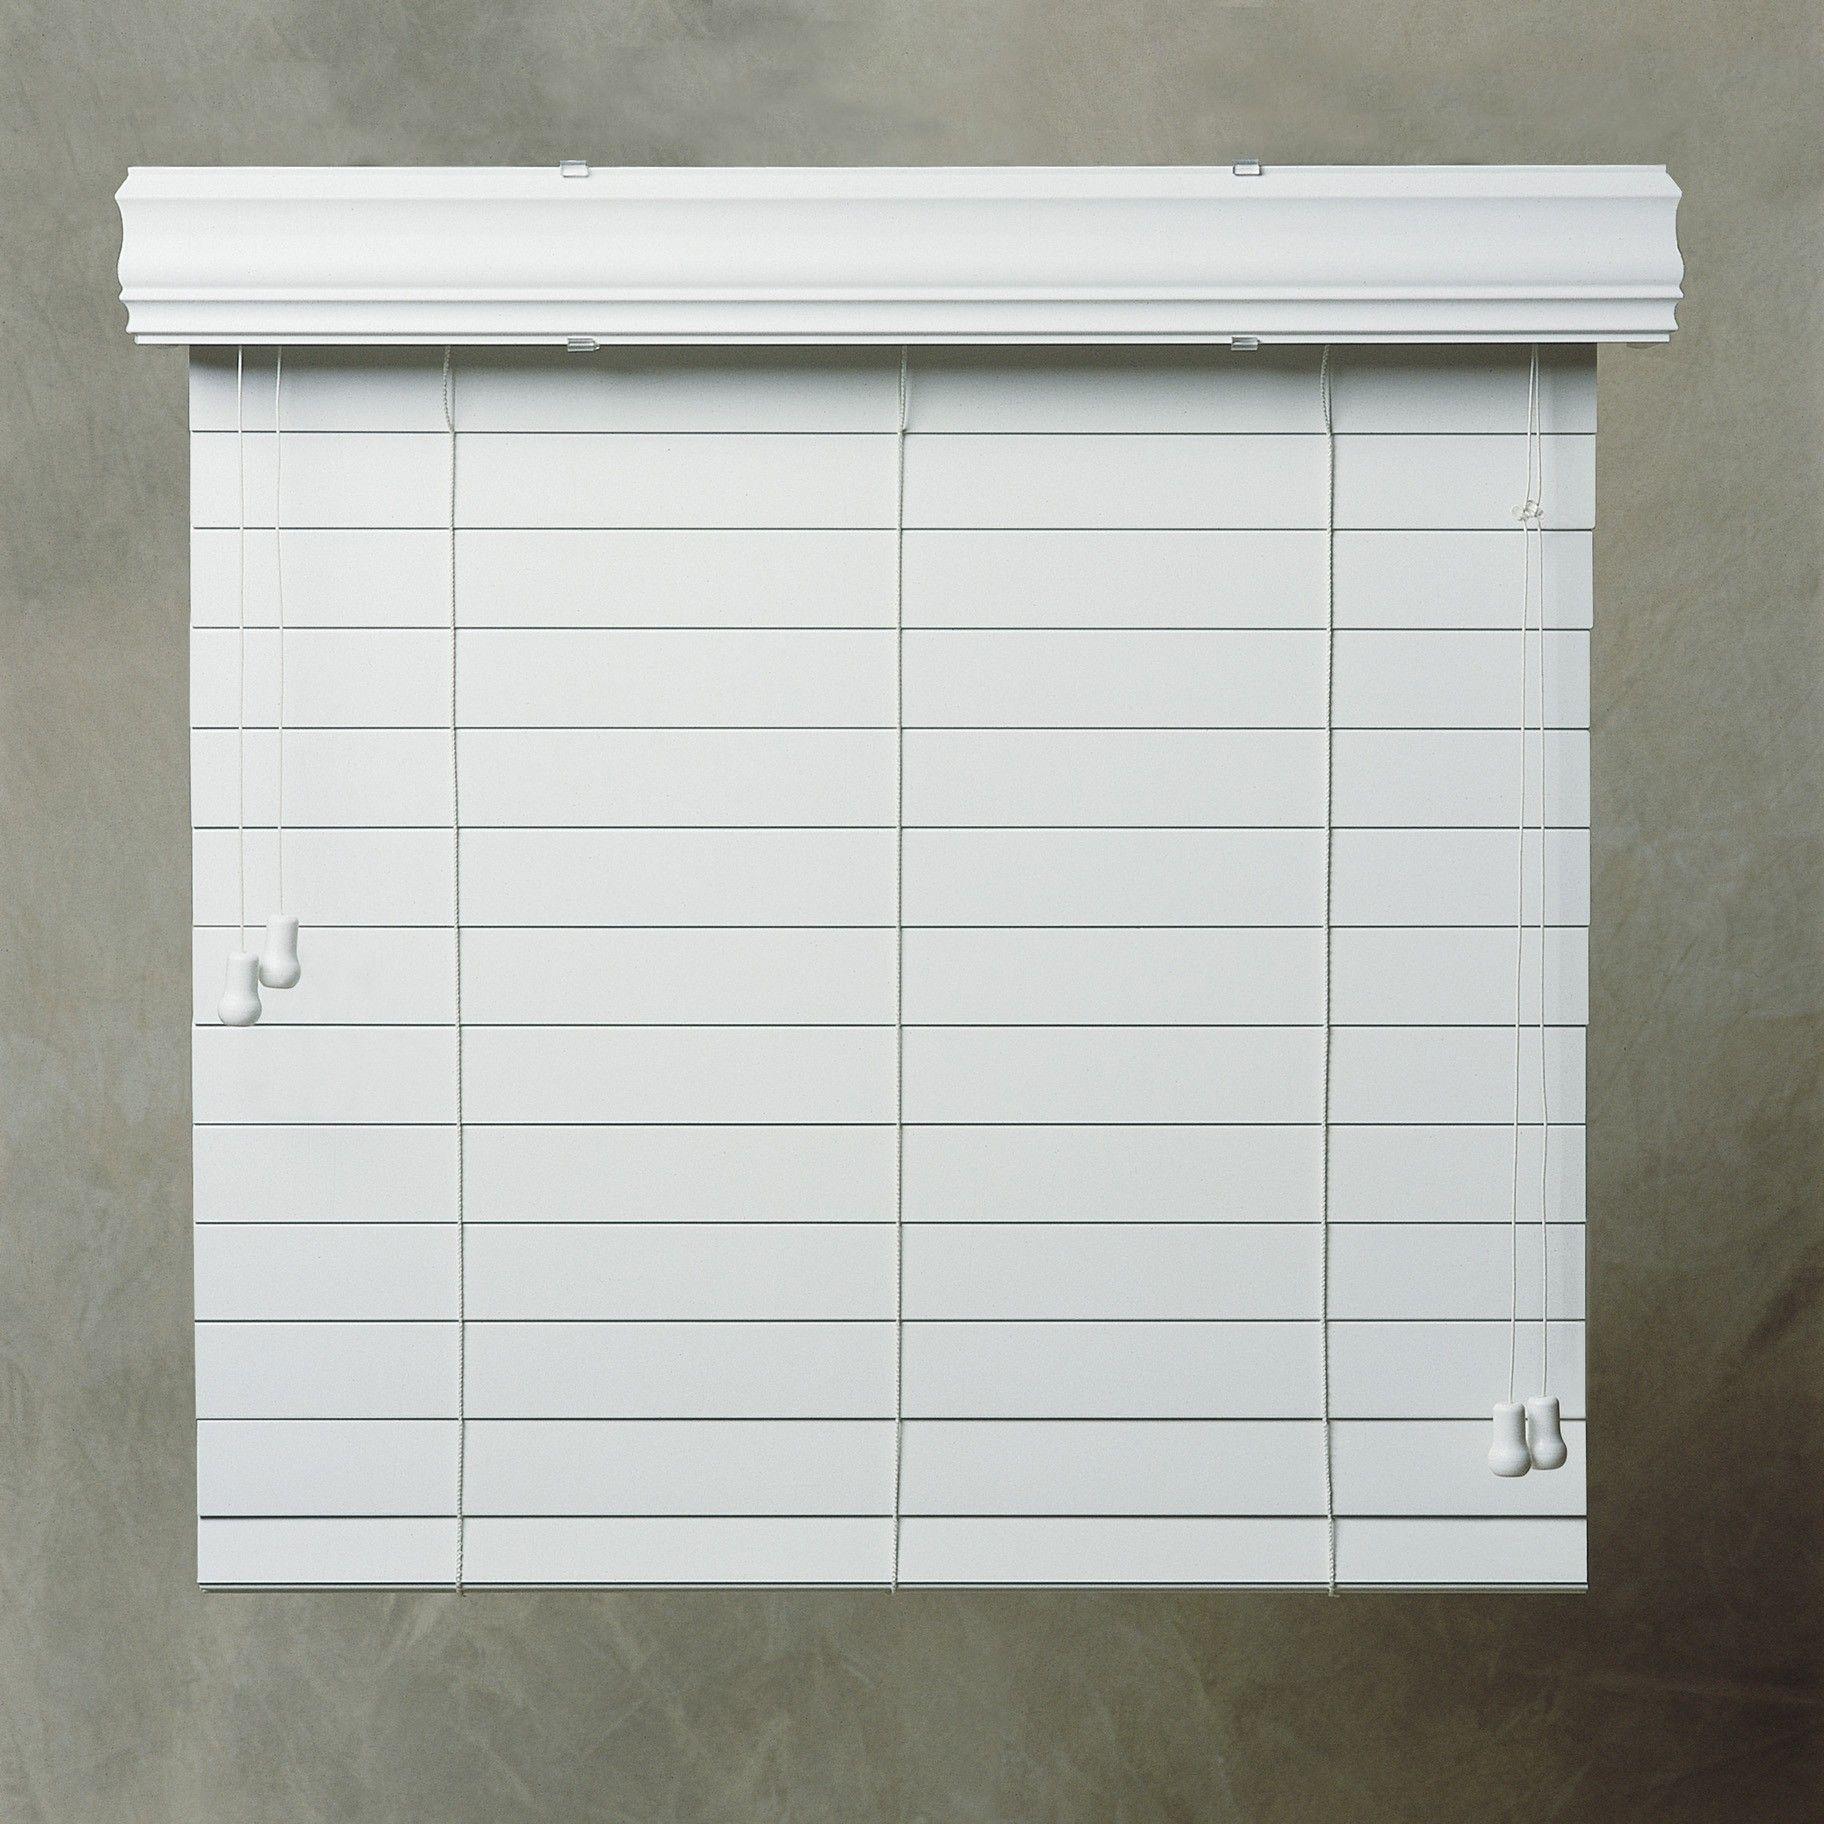 simple white aluminum outside mount mini blinds design for hanging